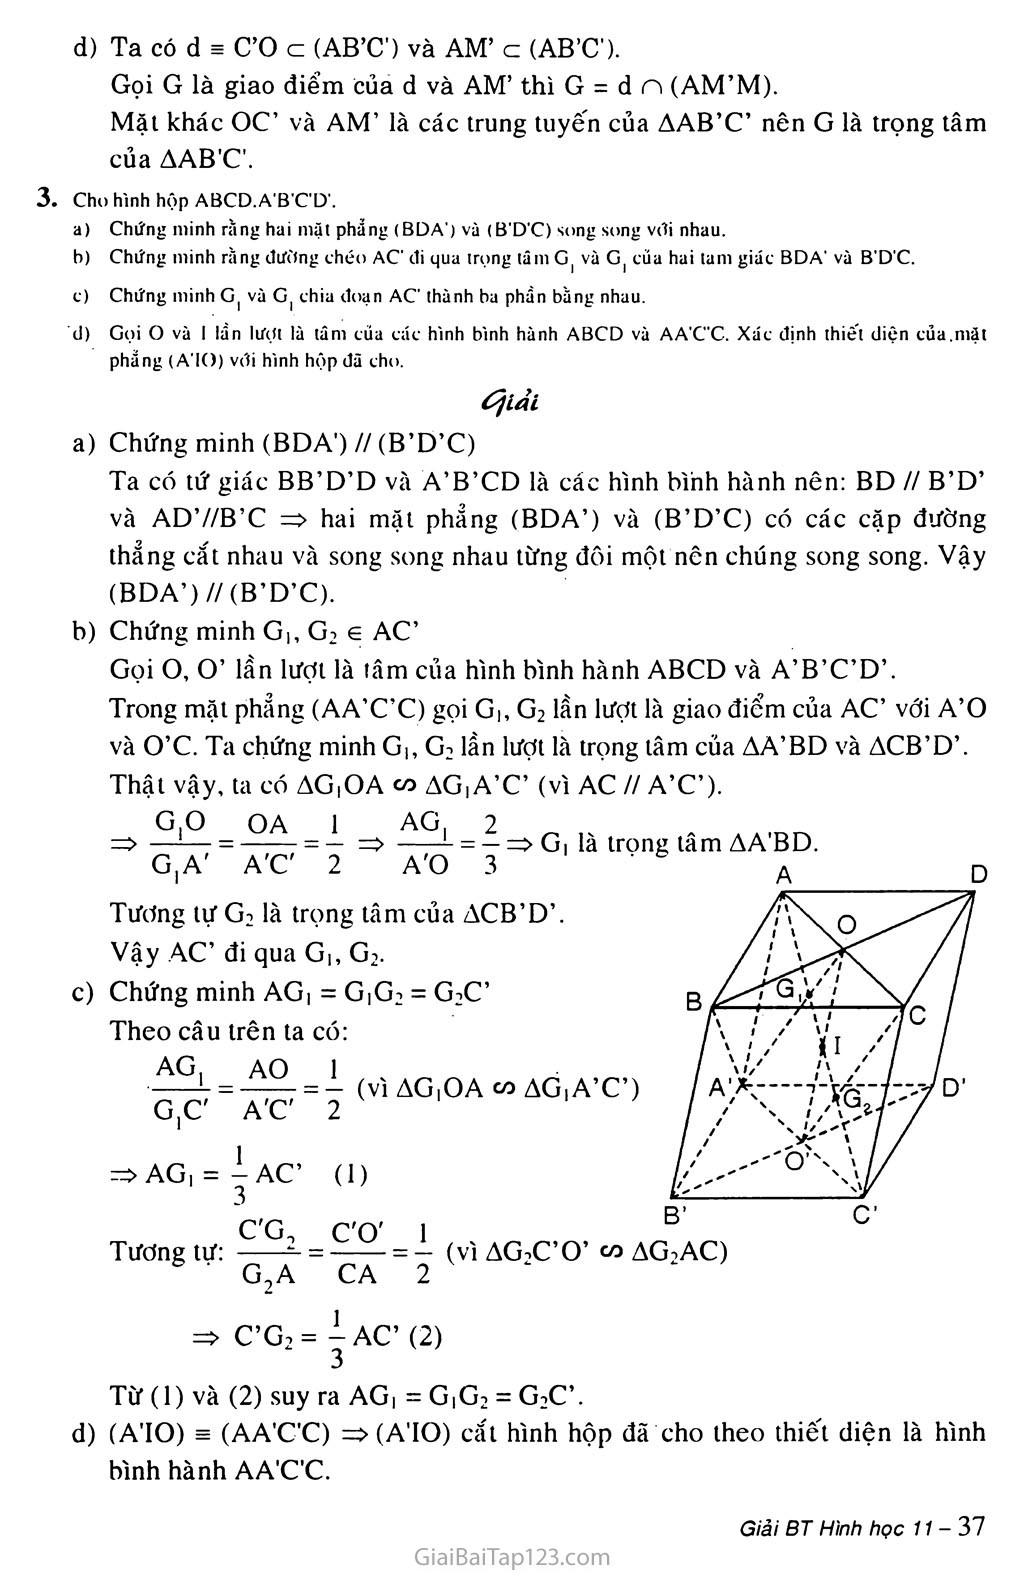 Bài 4. Hai mặt phẳng song song trang 4